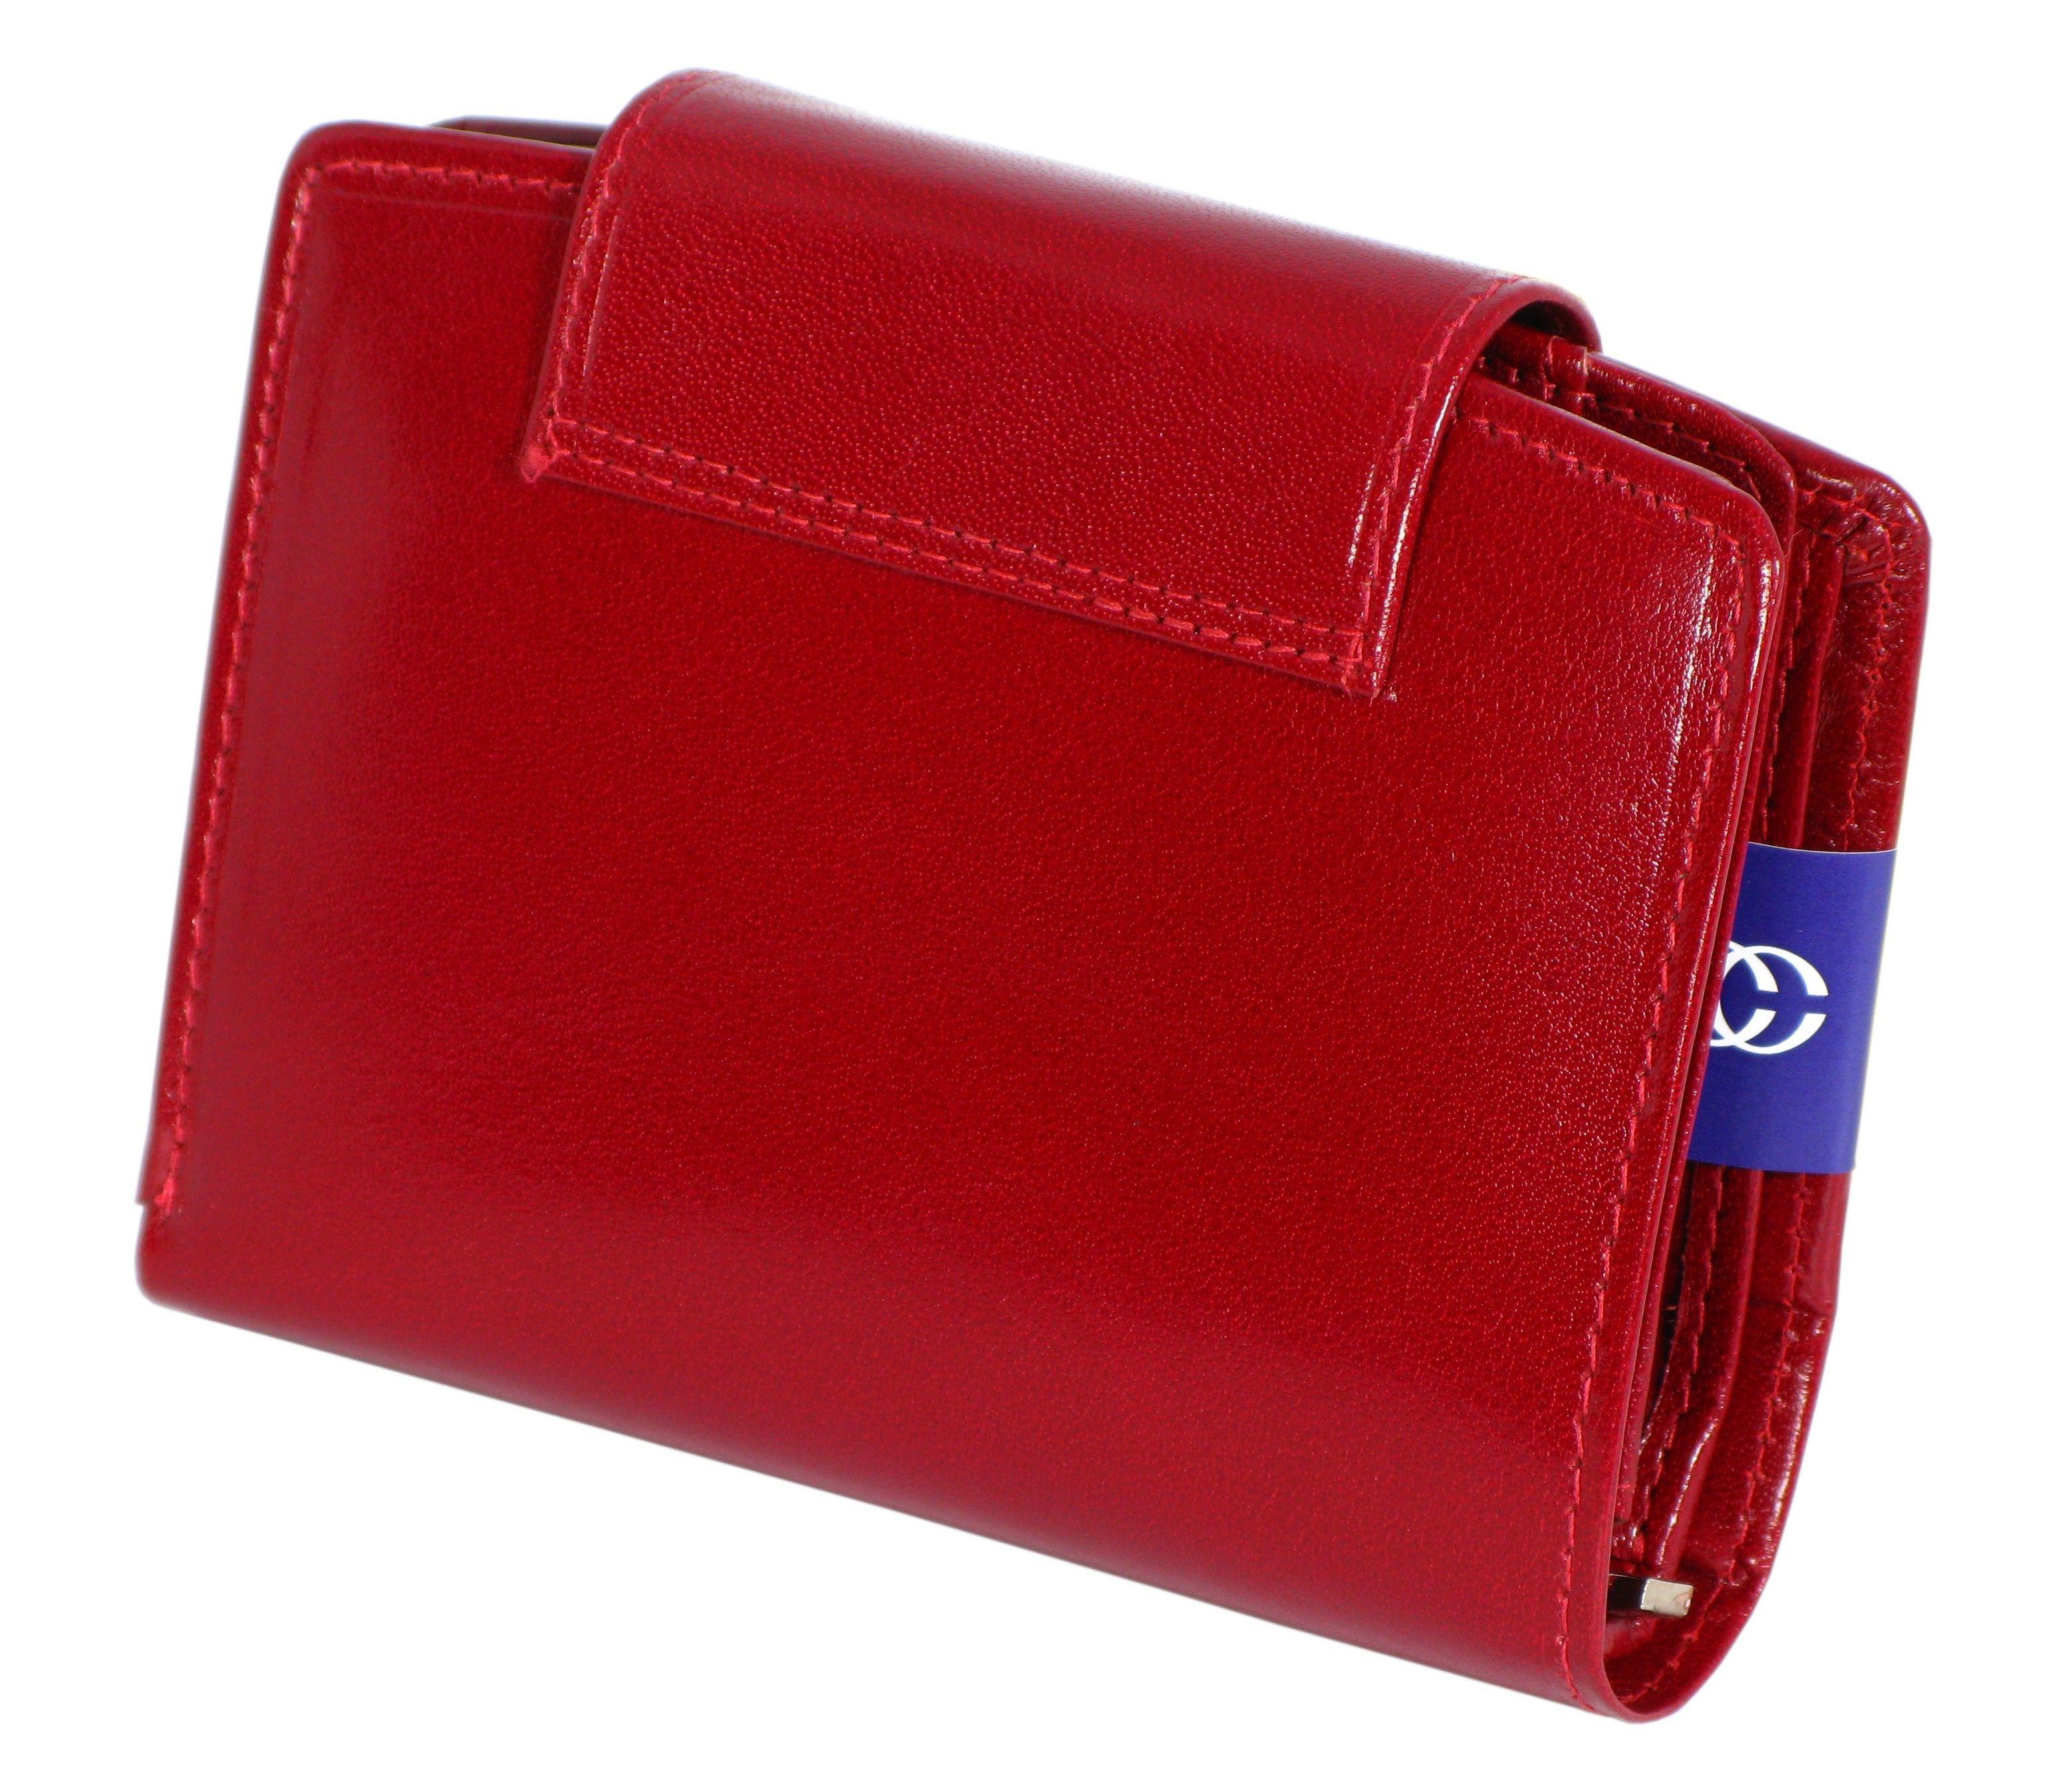 d9811f1d7cfb6 portfel damski skórzany allegro cefirutti czerwony portfel damski skórzany  allegro cefirutti czerwony ...